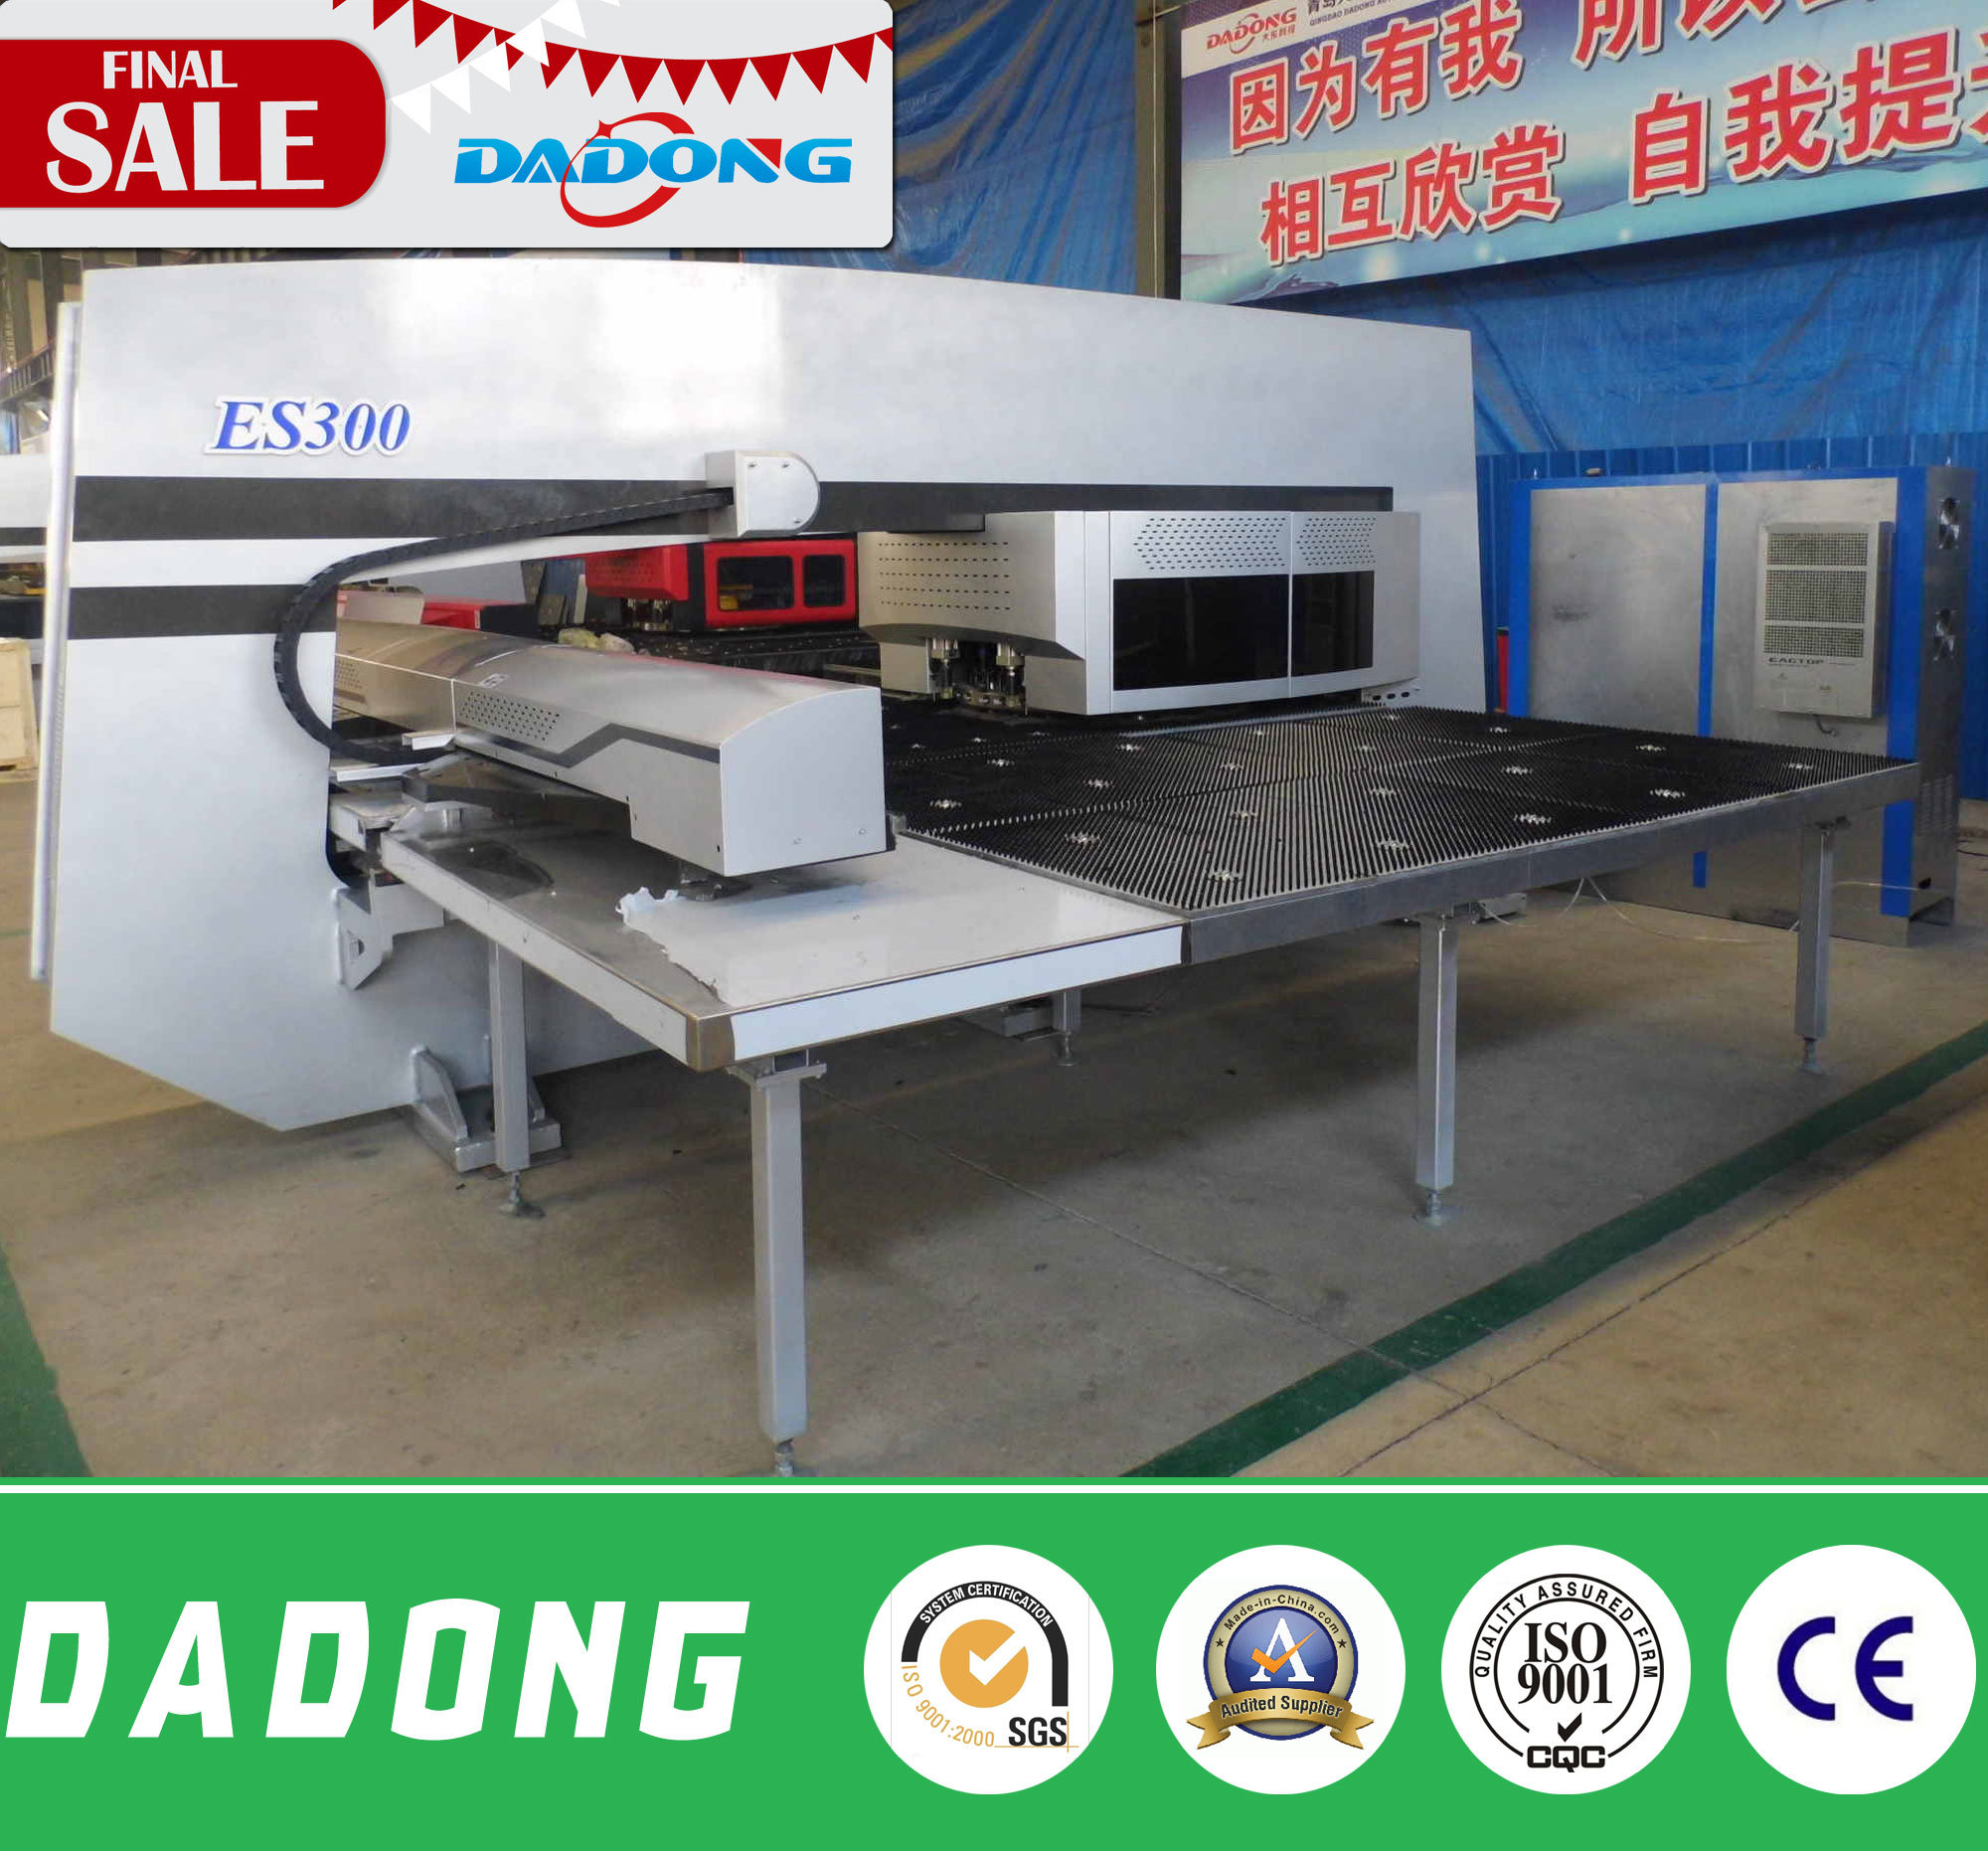 High Efficiency CNC Mechanical Turret Punch Press/CNC Punching Machine Es300